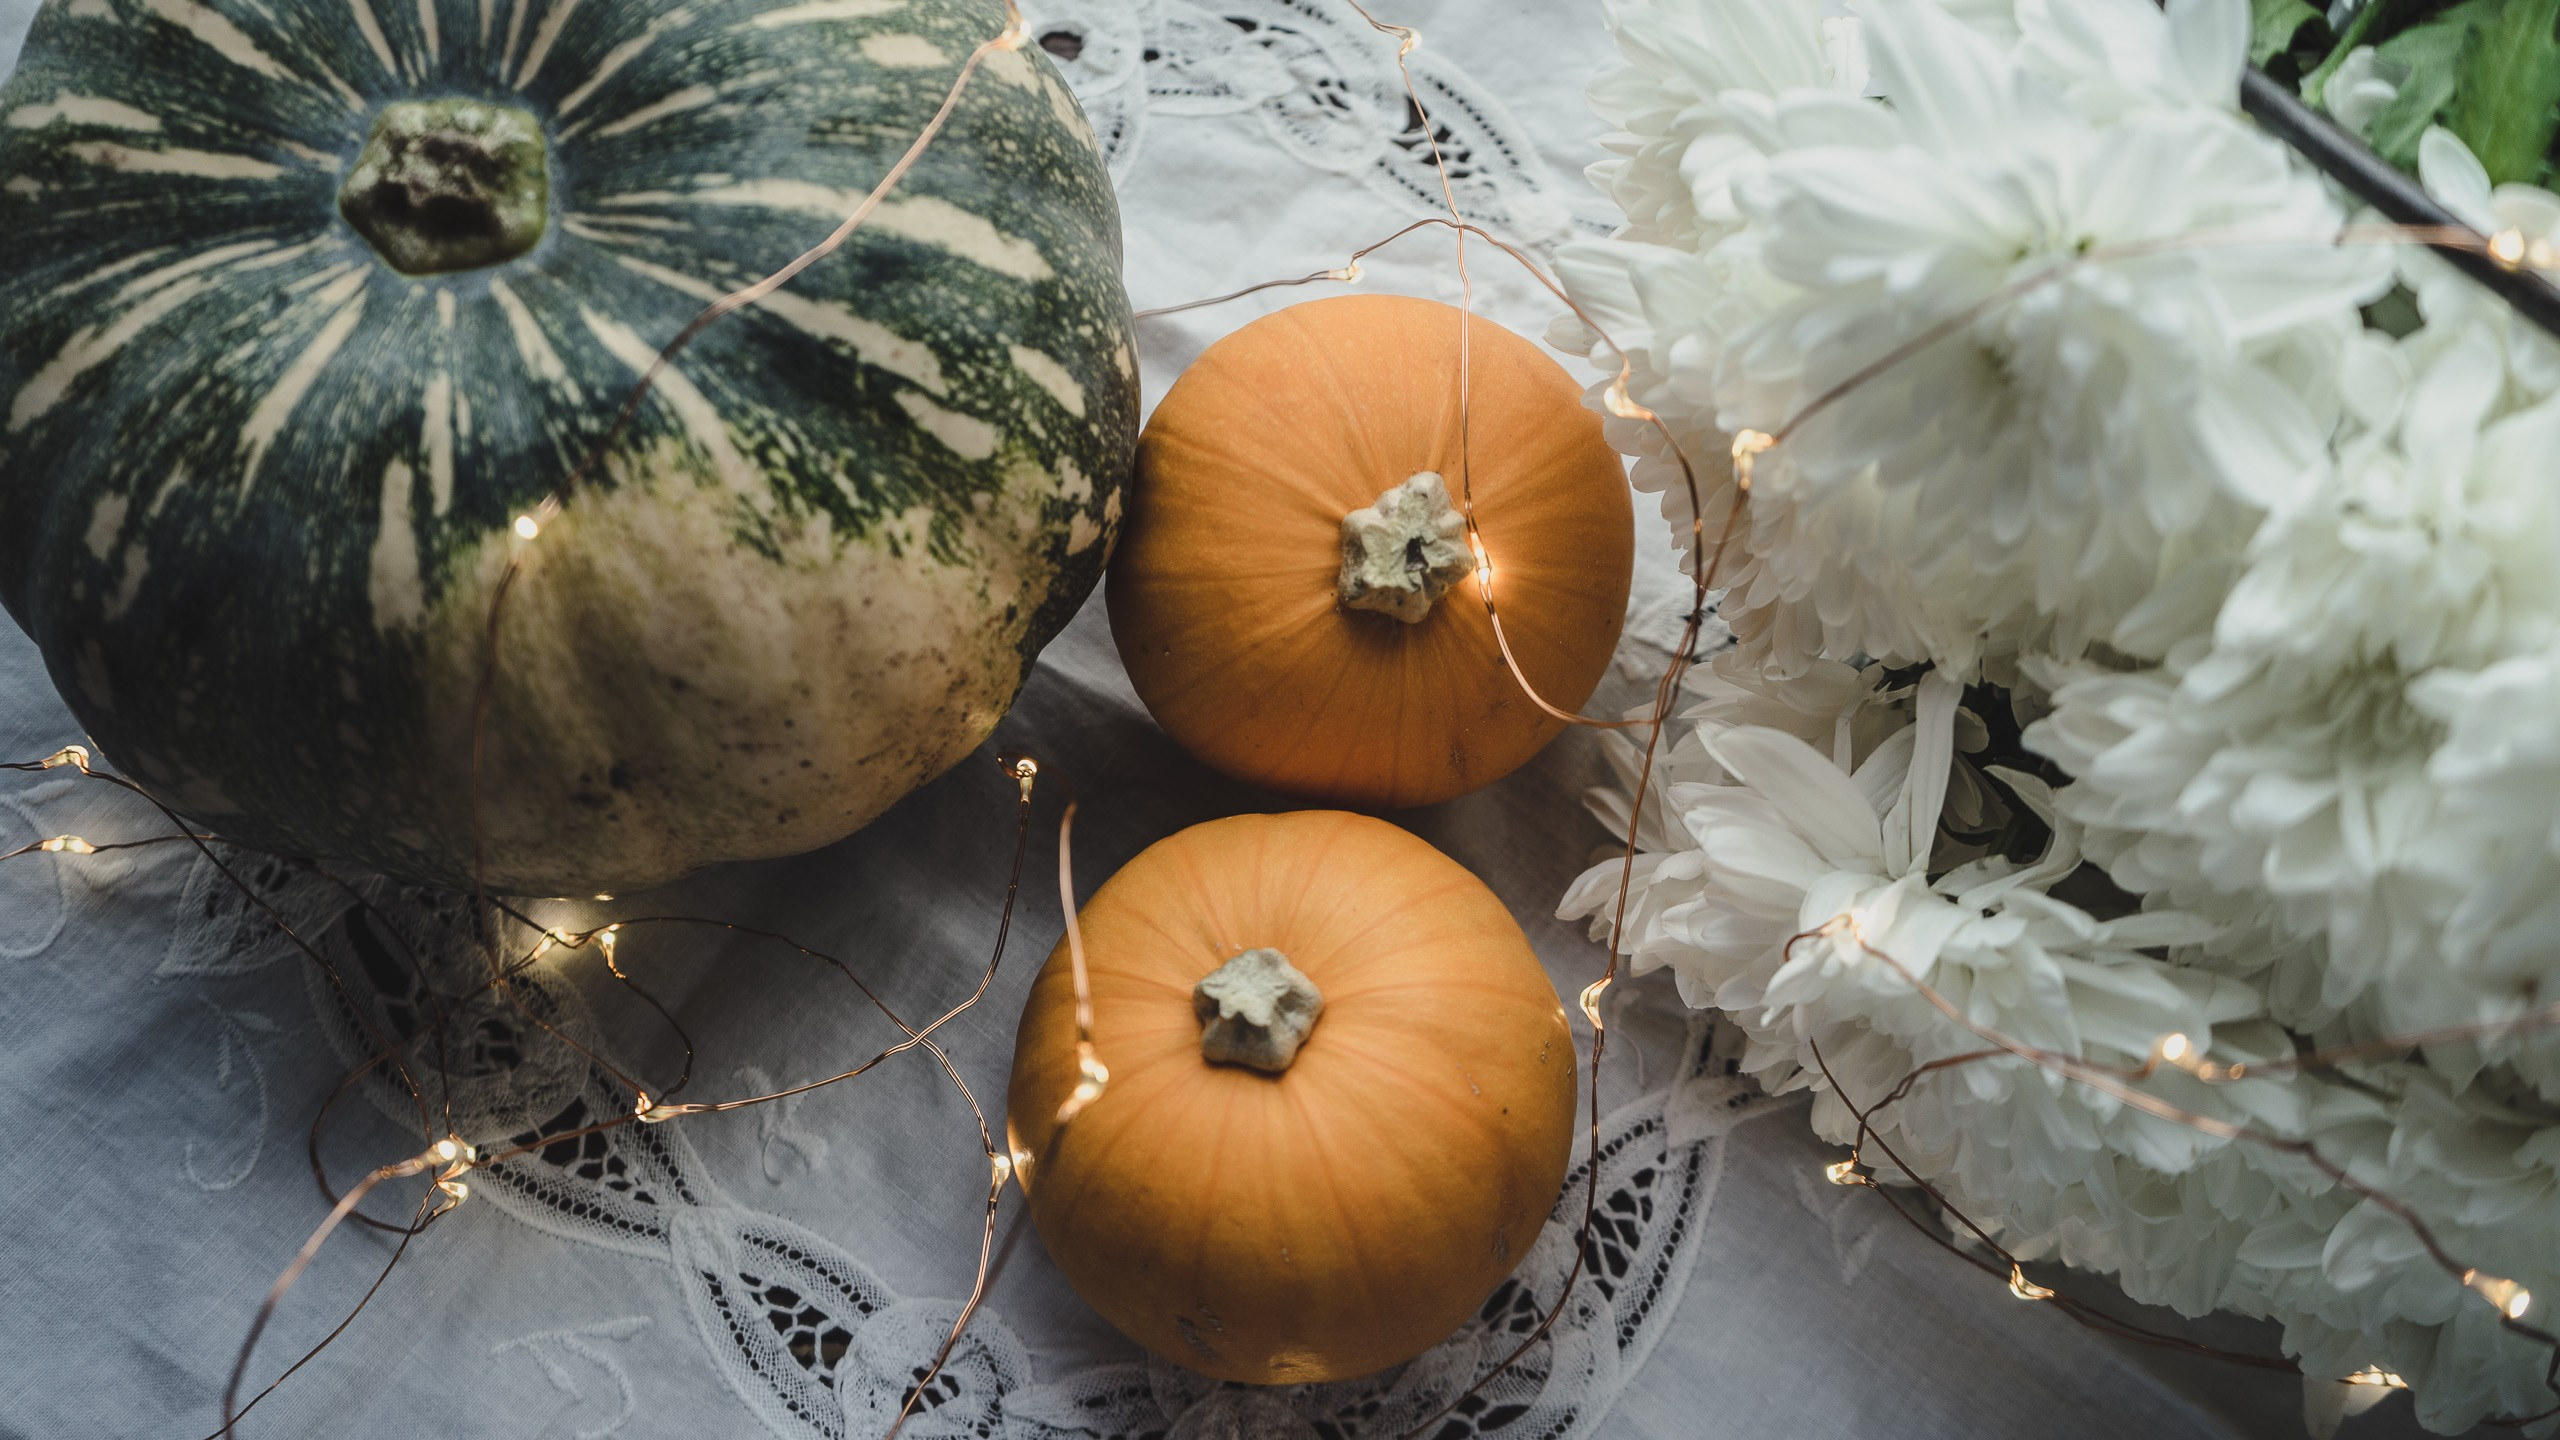 Creative lighting for your pumpkins | Photofocus